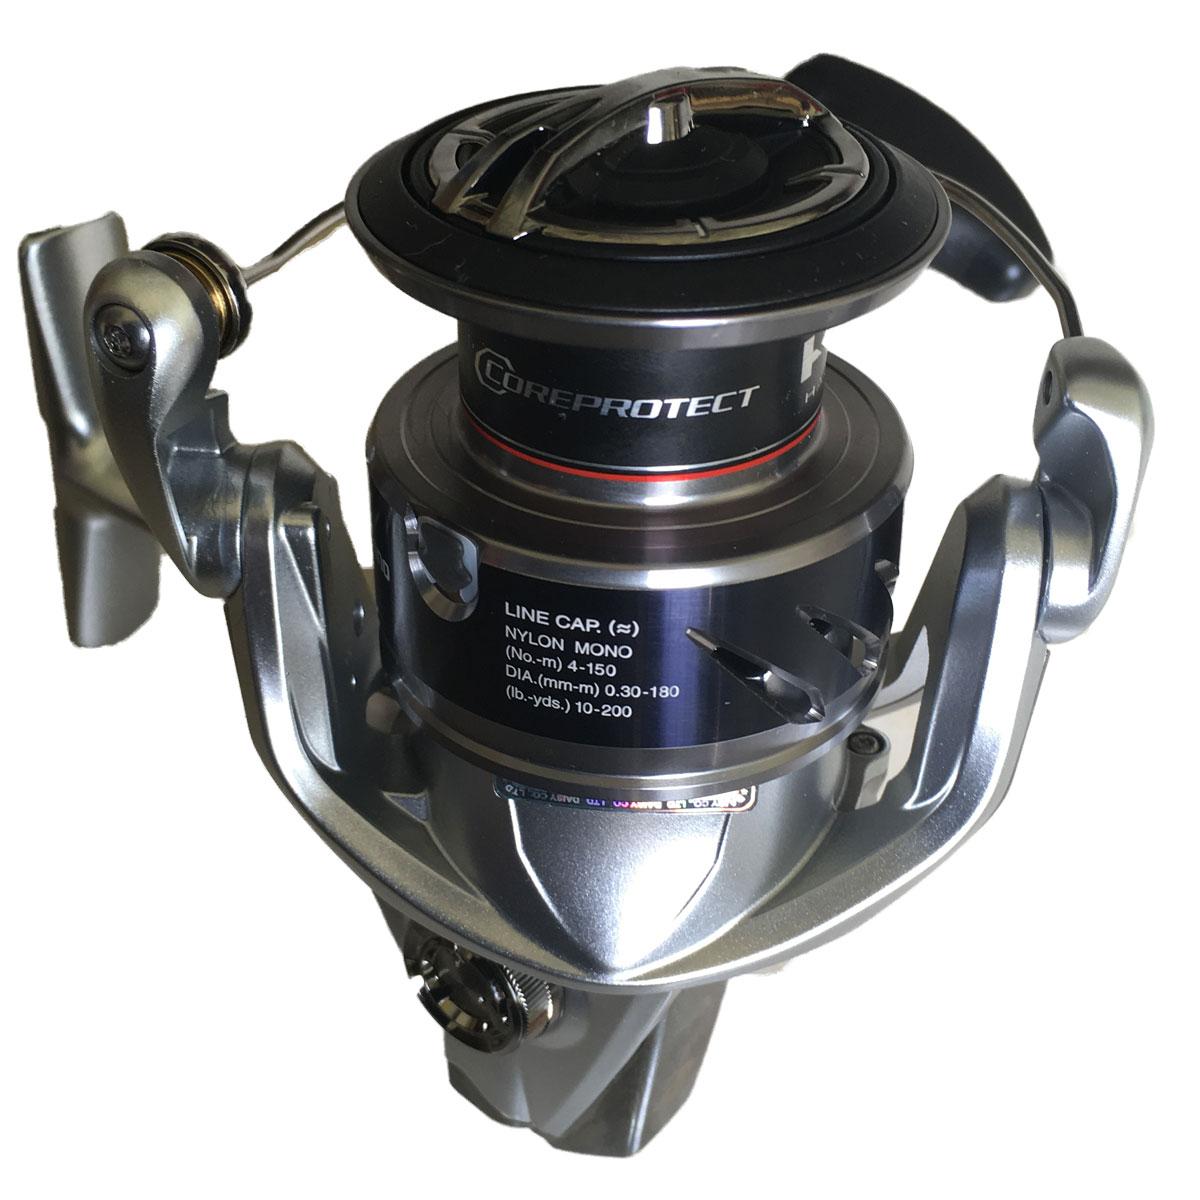 Máy Câu Cá Shimano Spinning Stradic C4000 XG 2015 BH 1 Năm